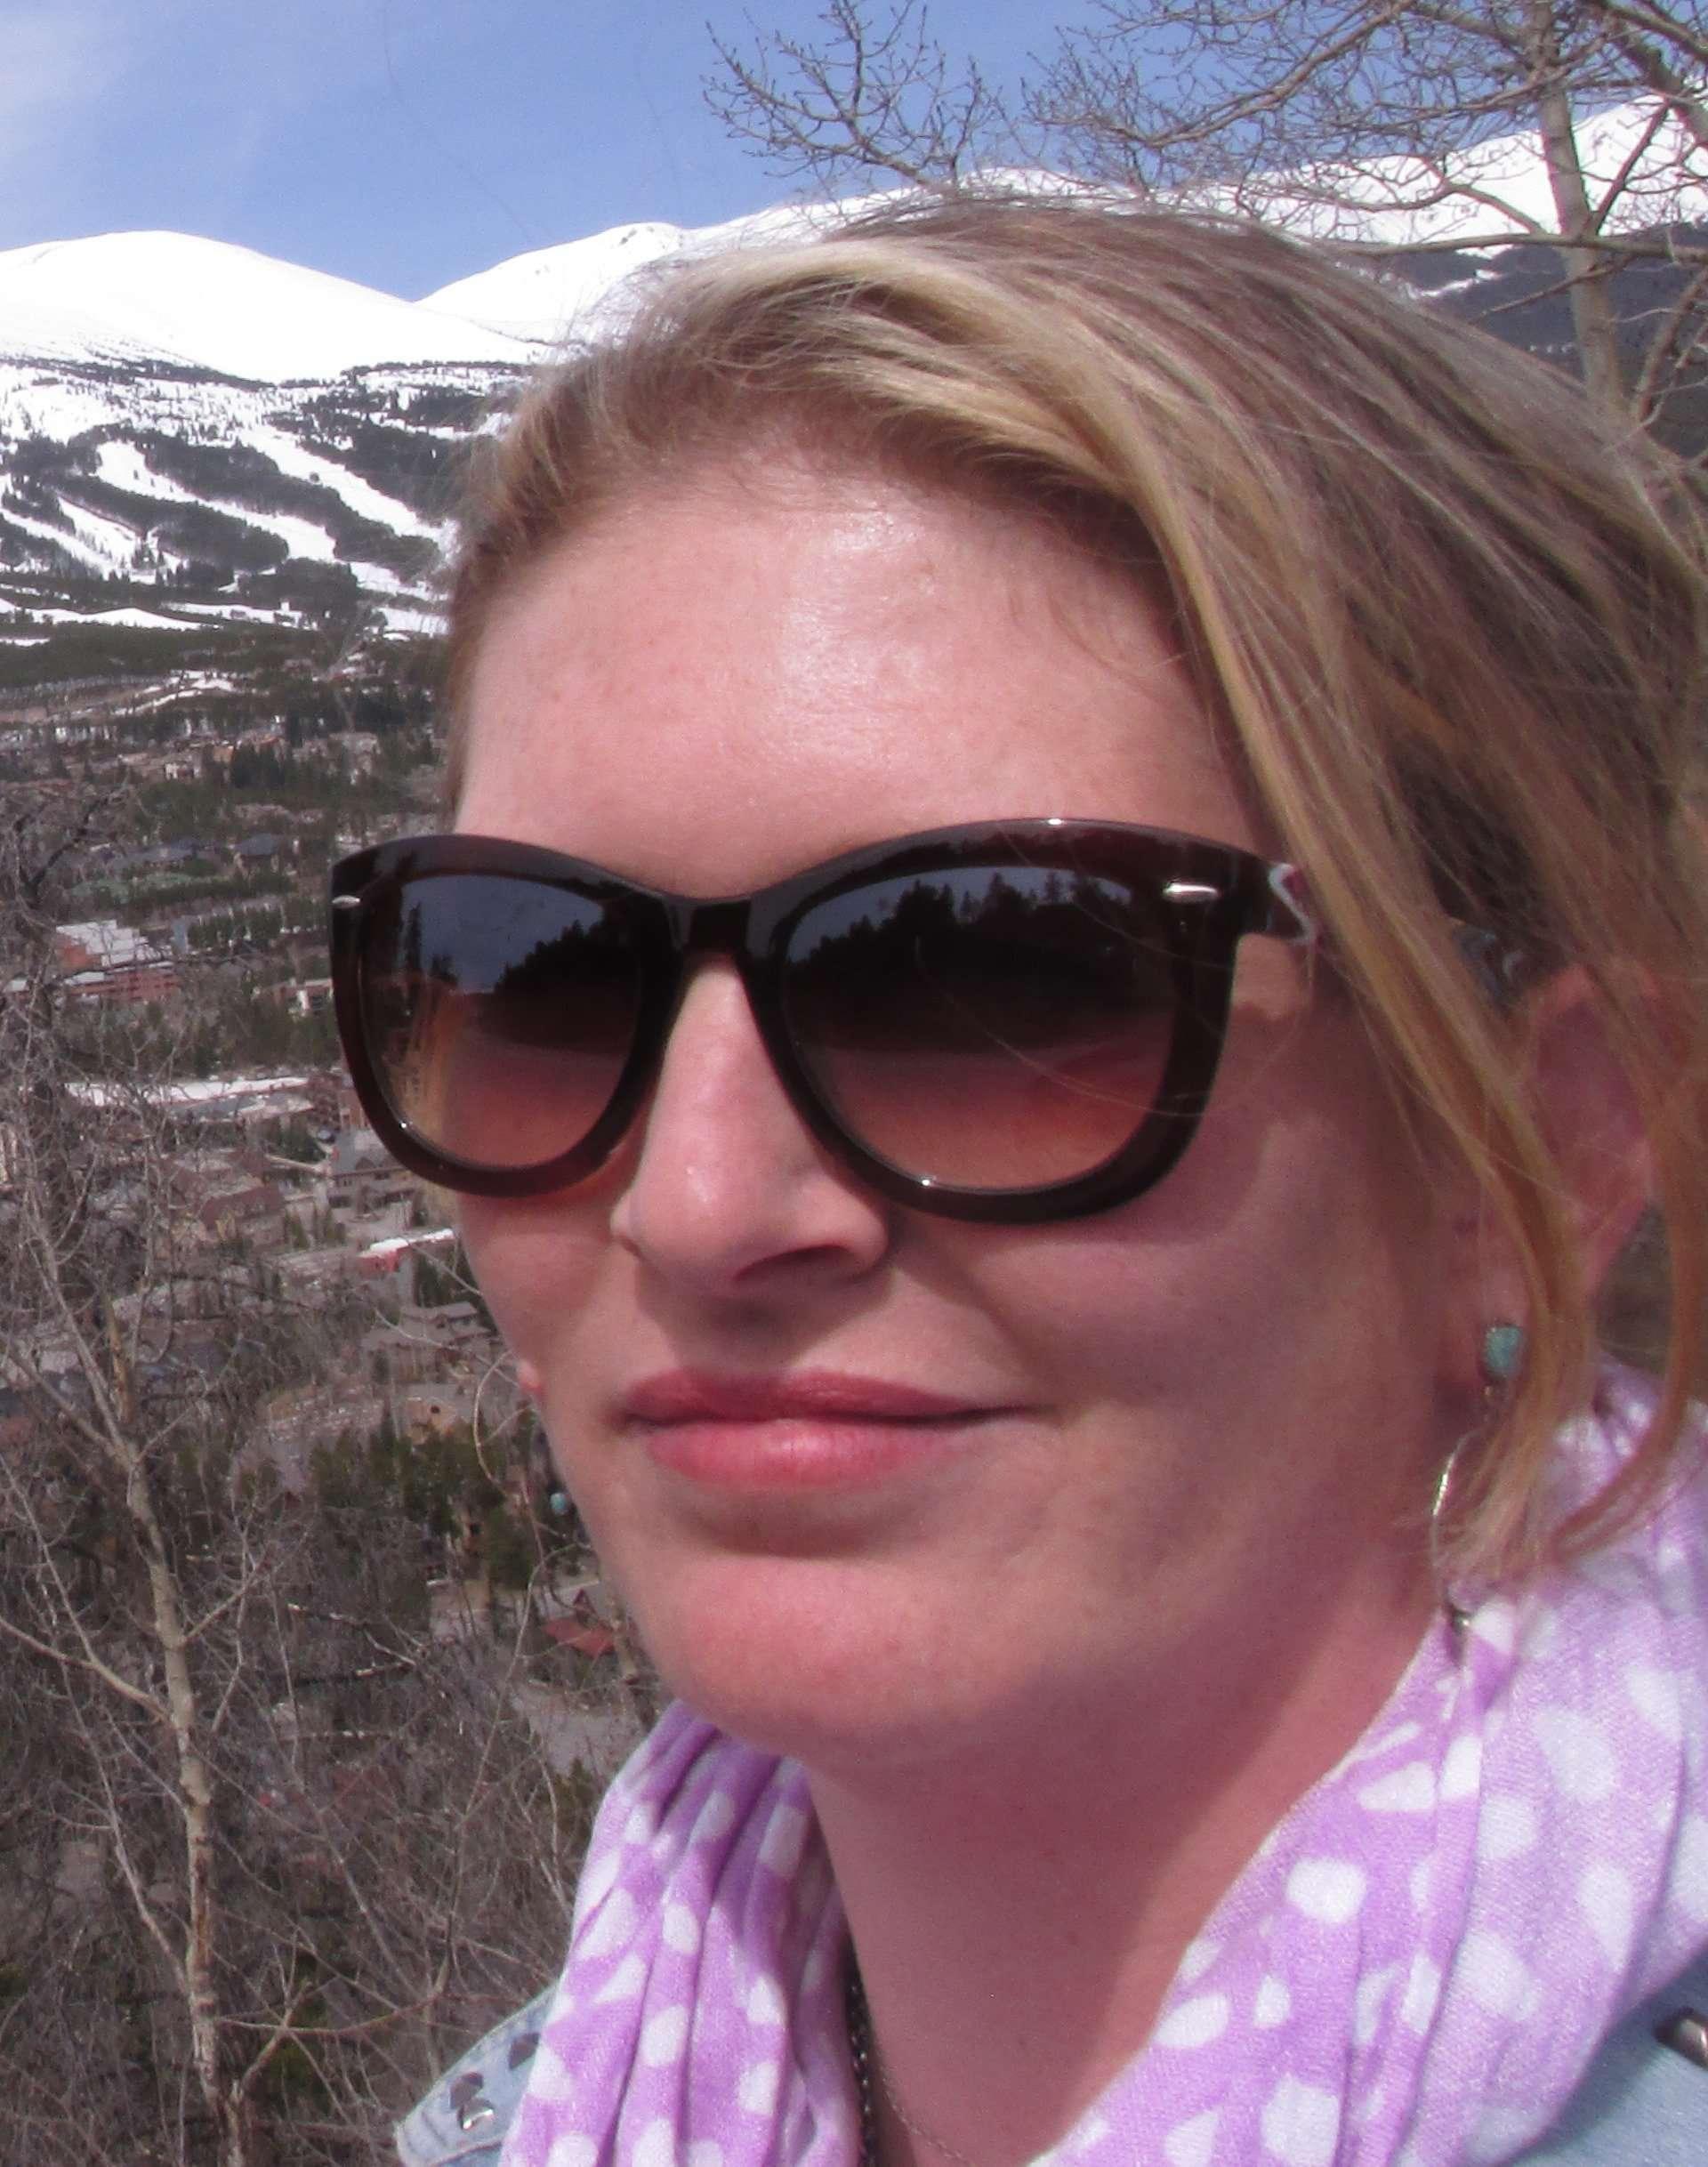 Activist and jewelry designer Vanessa Waltz